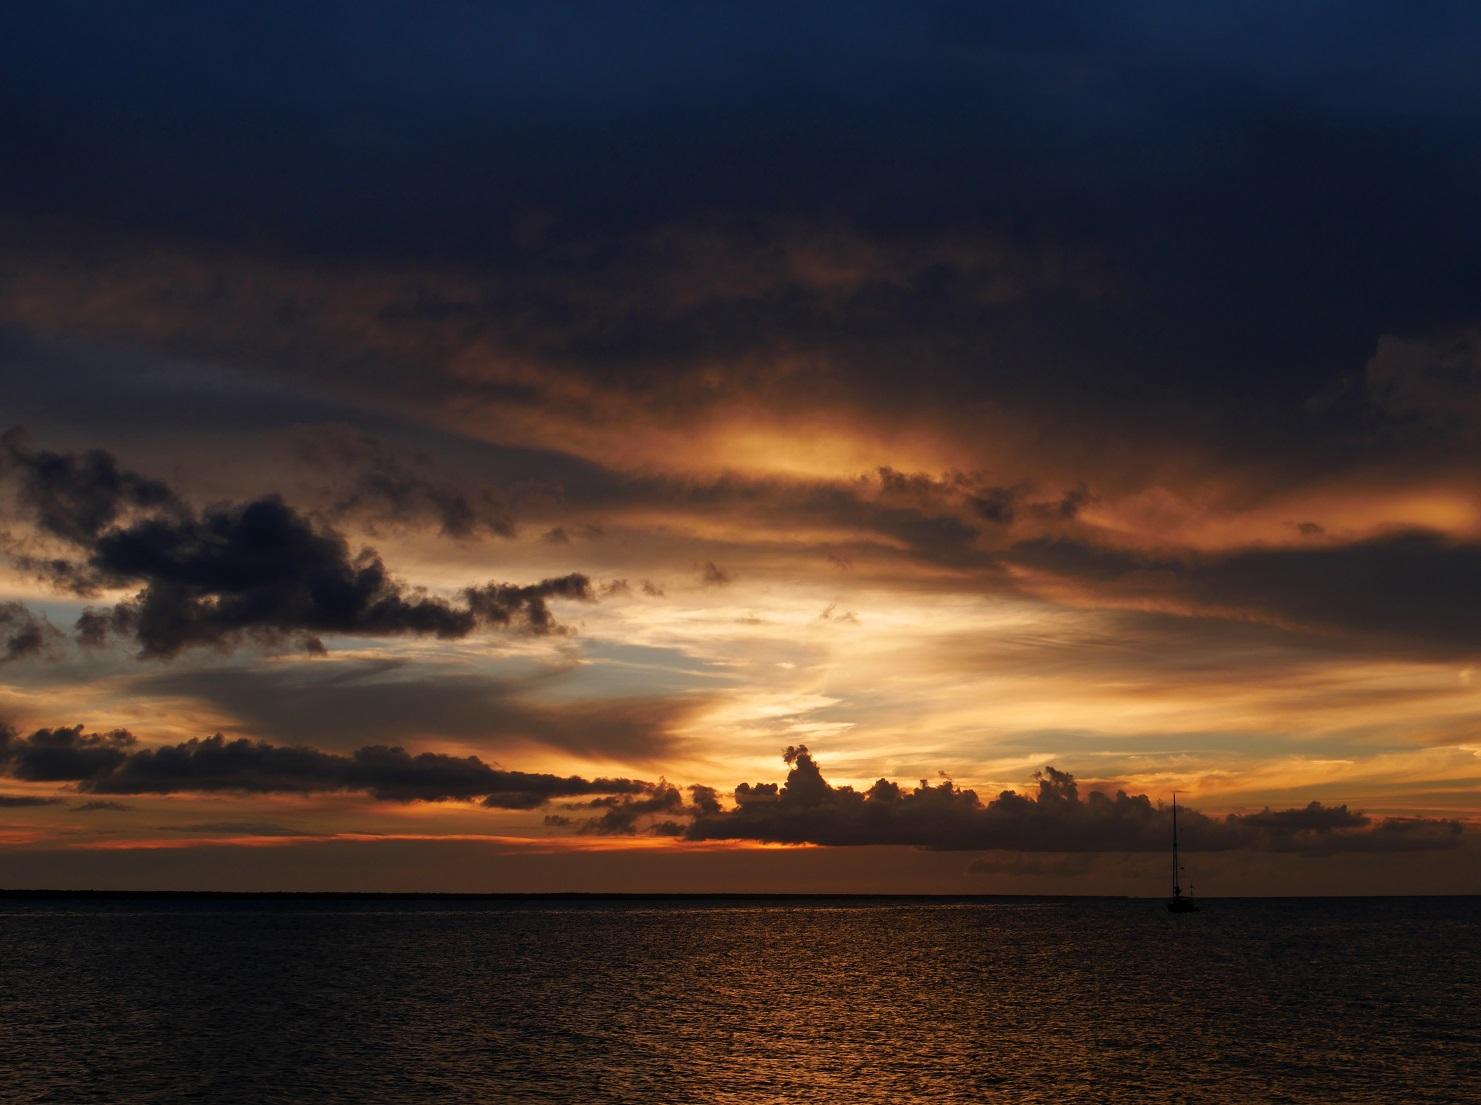 Sunset - Green Turtle Cay, Abaco, Bahamas